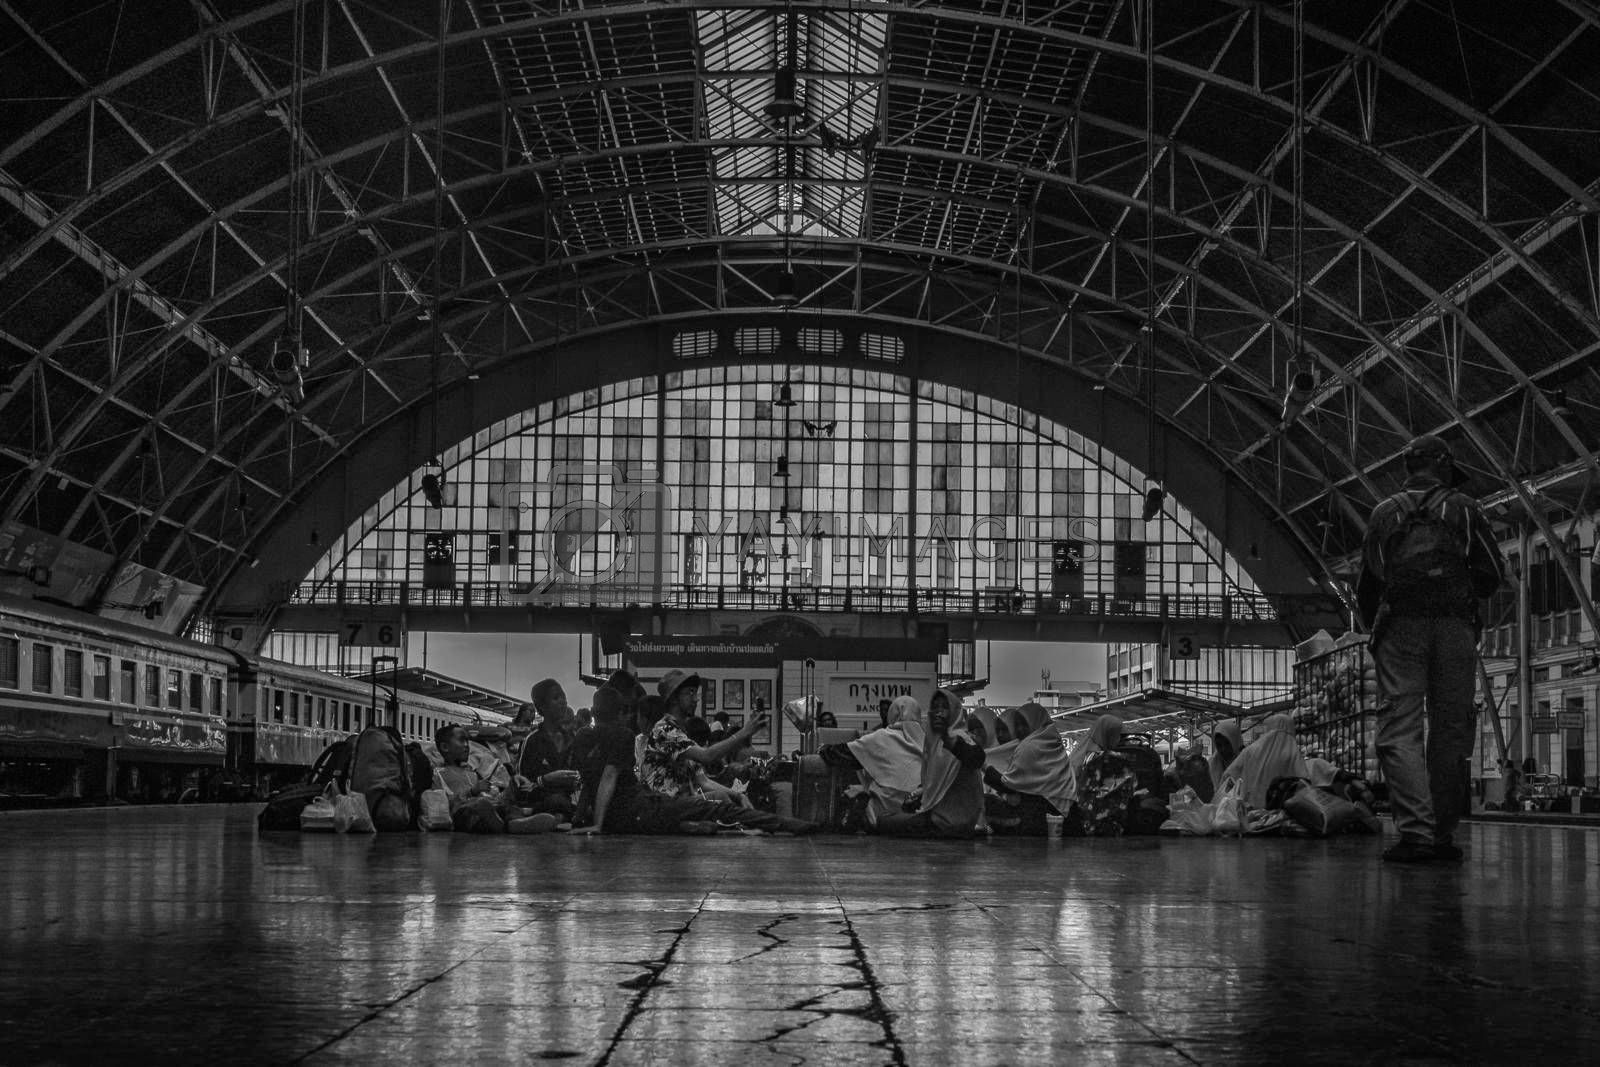 Bangkok, thailand - jun 29, 2019 : Peoples who sit and wait to return to their homeland. Bangkok Railway Station or Hua Lamphong Station is the main railway station in Bangkok, Blackand white.